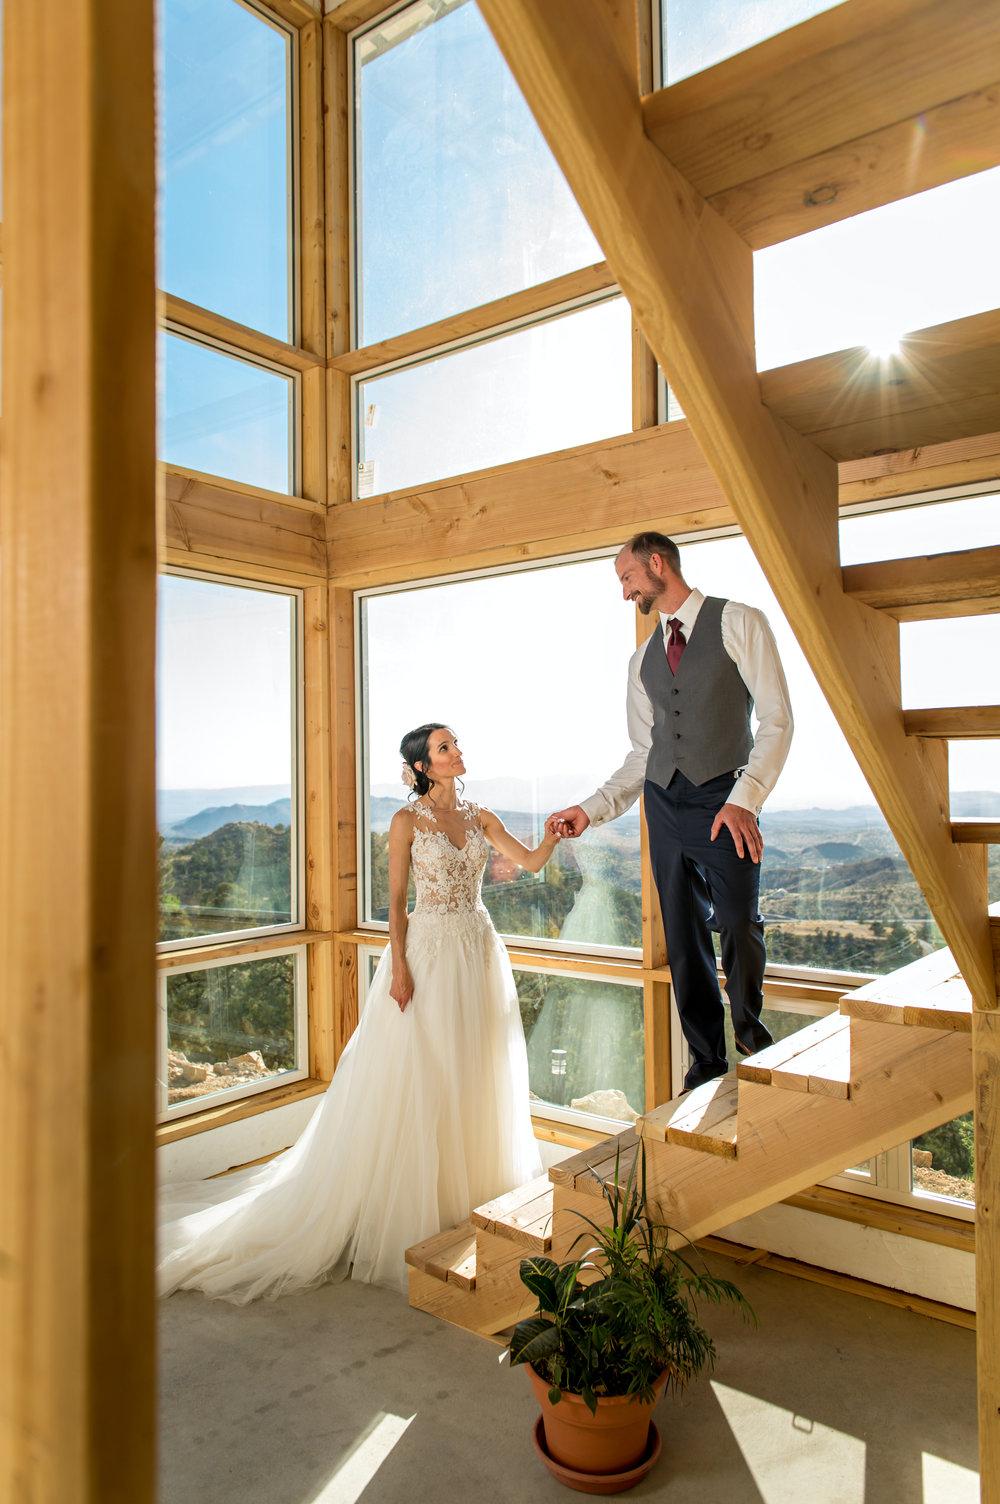 1-Dom-Wedding-May-19-2018-Photographer-Nickeys-Photo-Creations-12.jpg